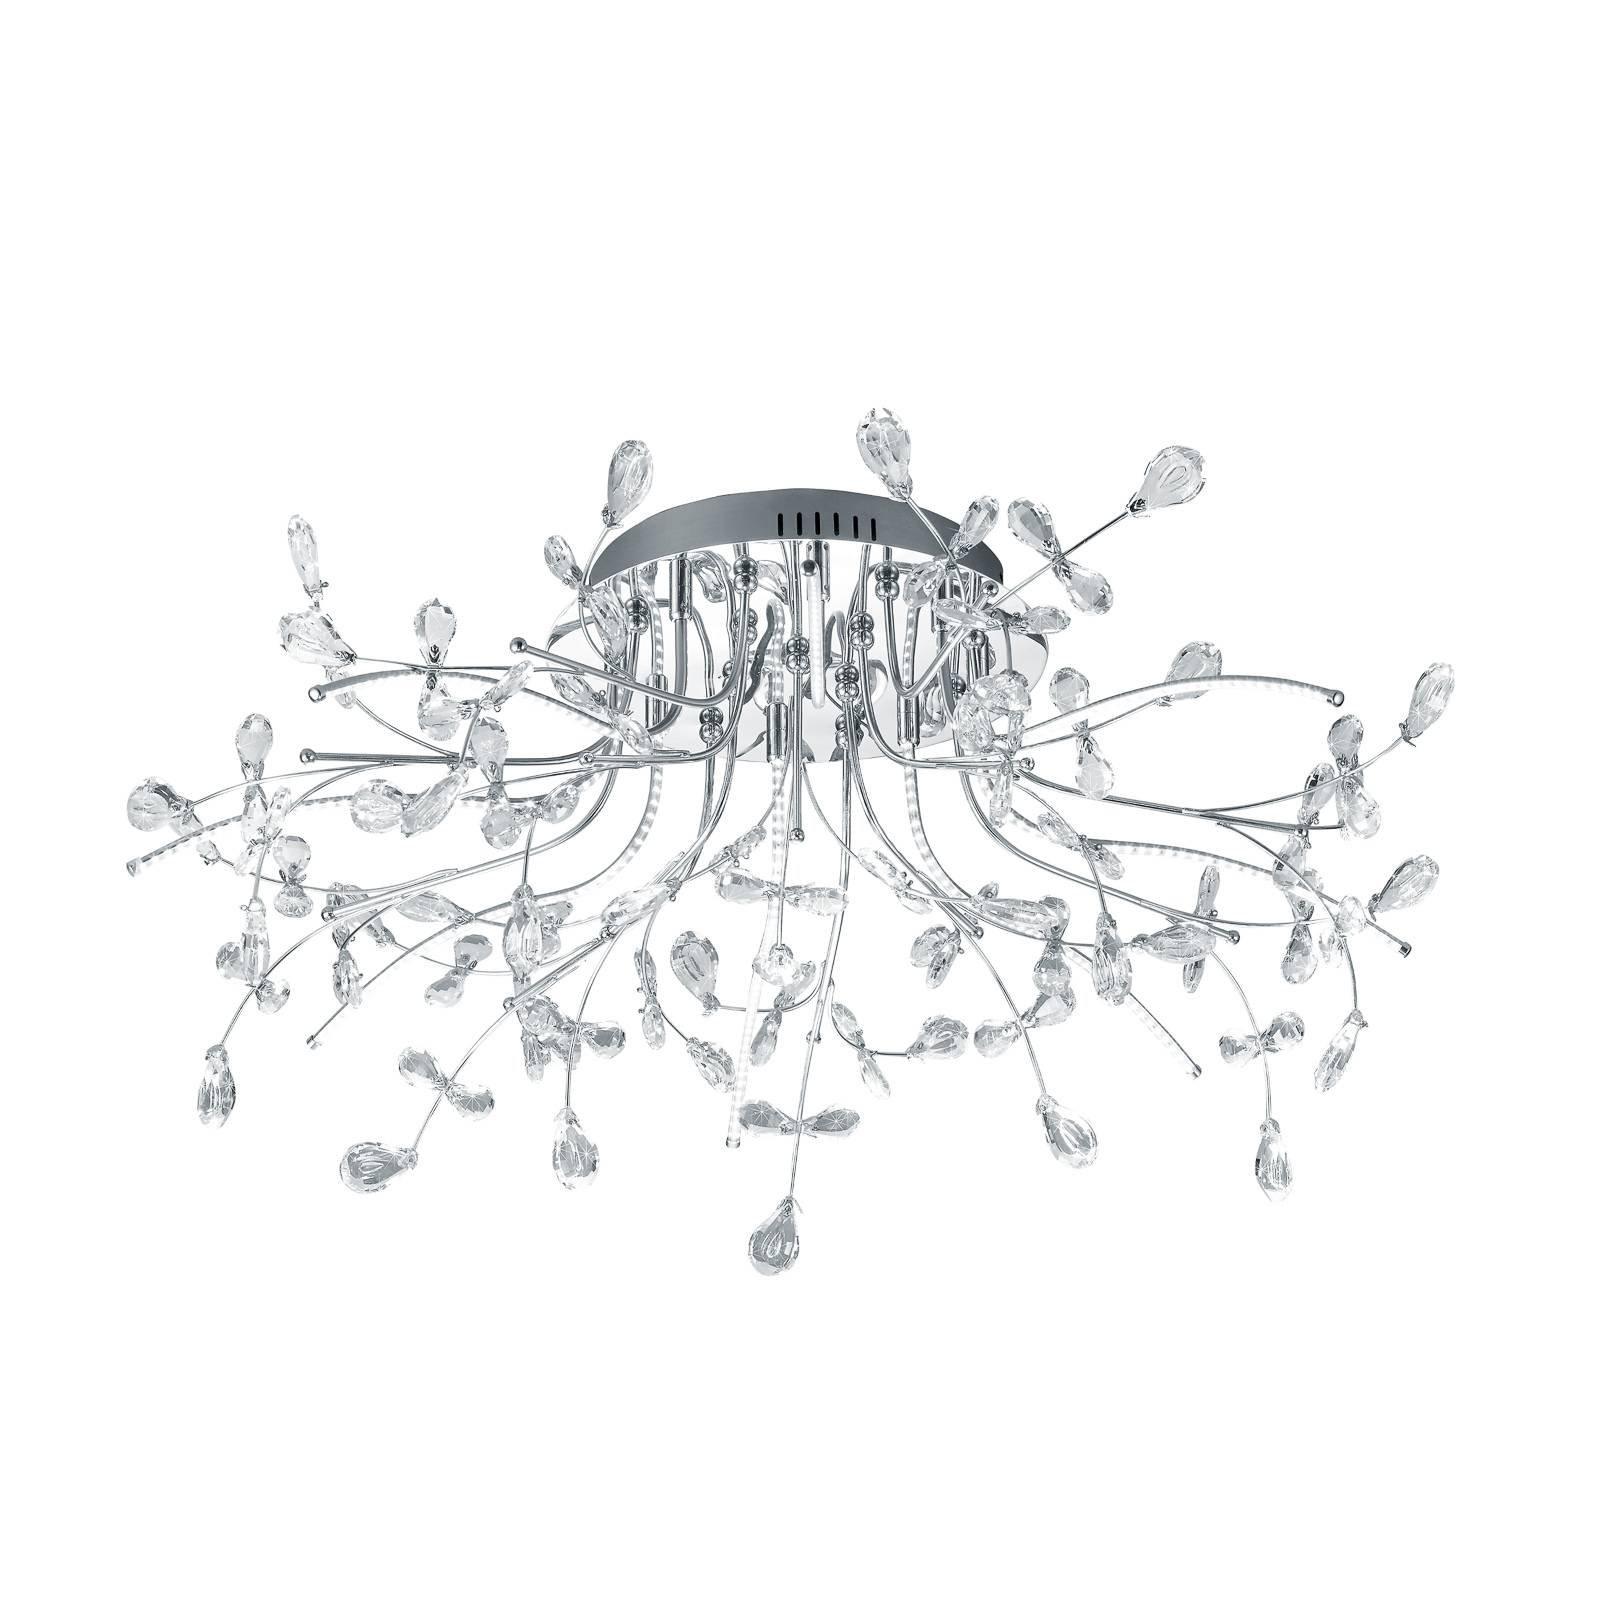 B-Leuchten Crystal taklampe, krom, 77 cm